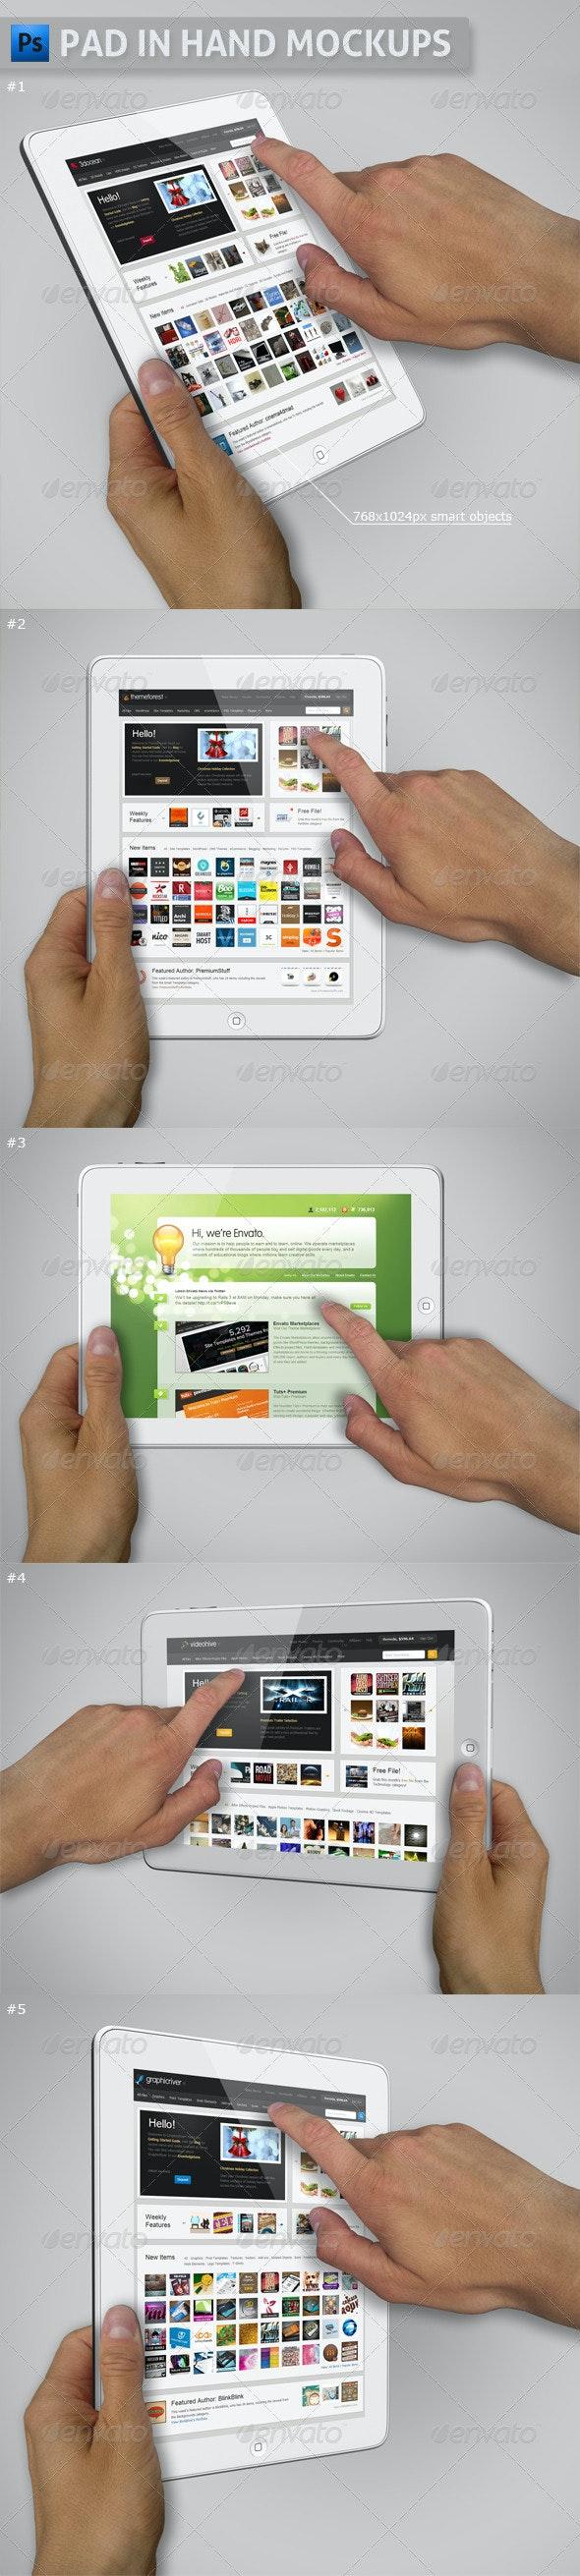 Pad in Hand Mockups - Mobile Displays